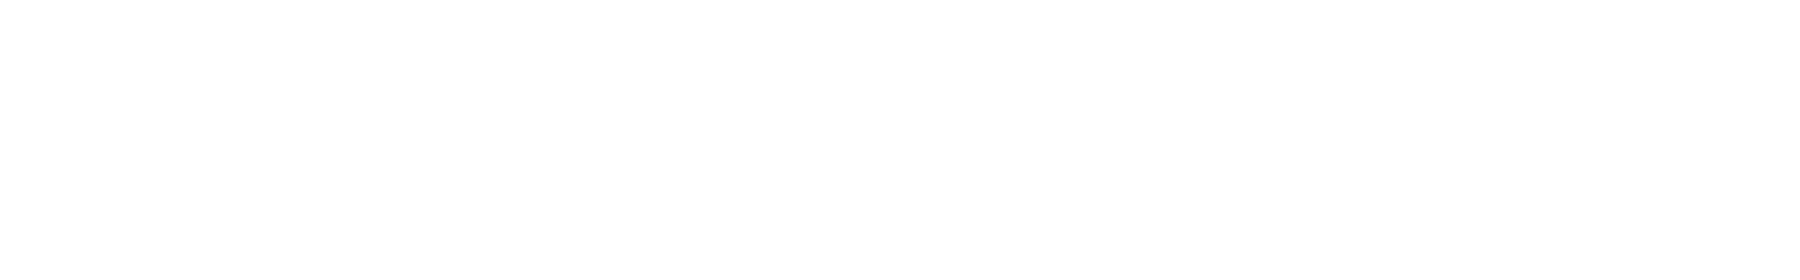 brassy melody